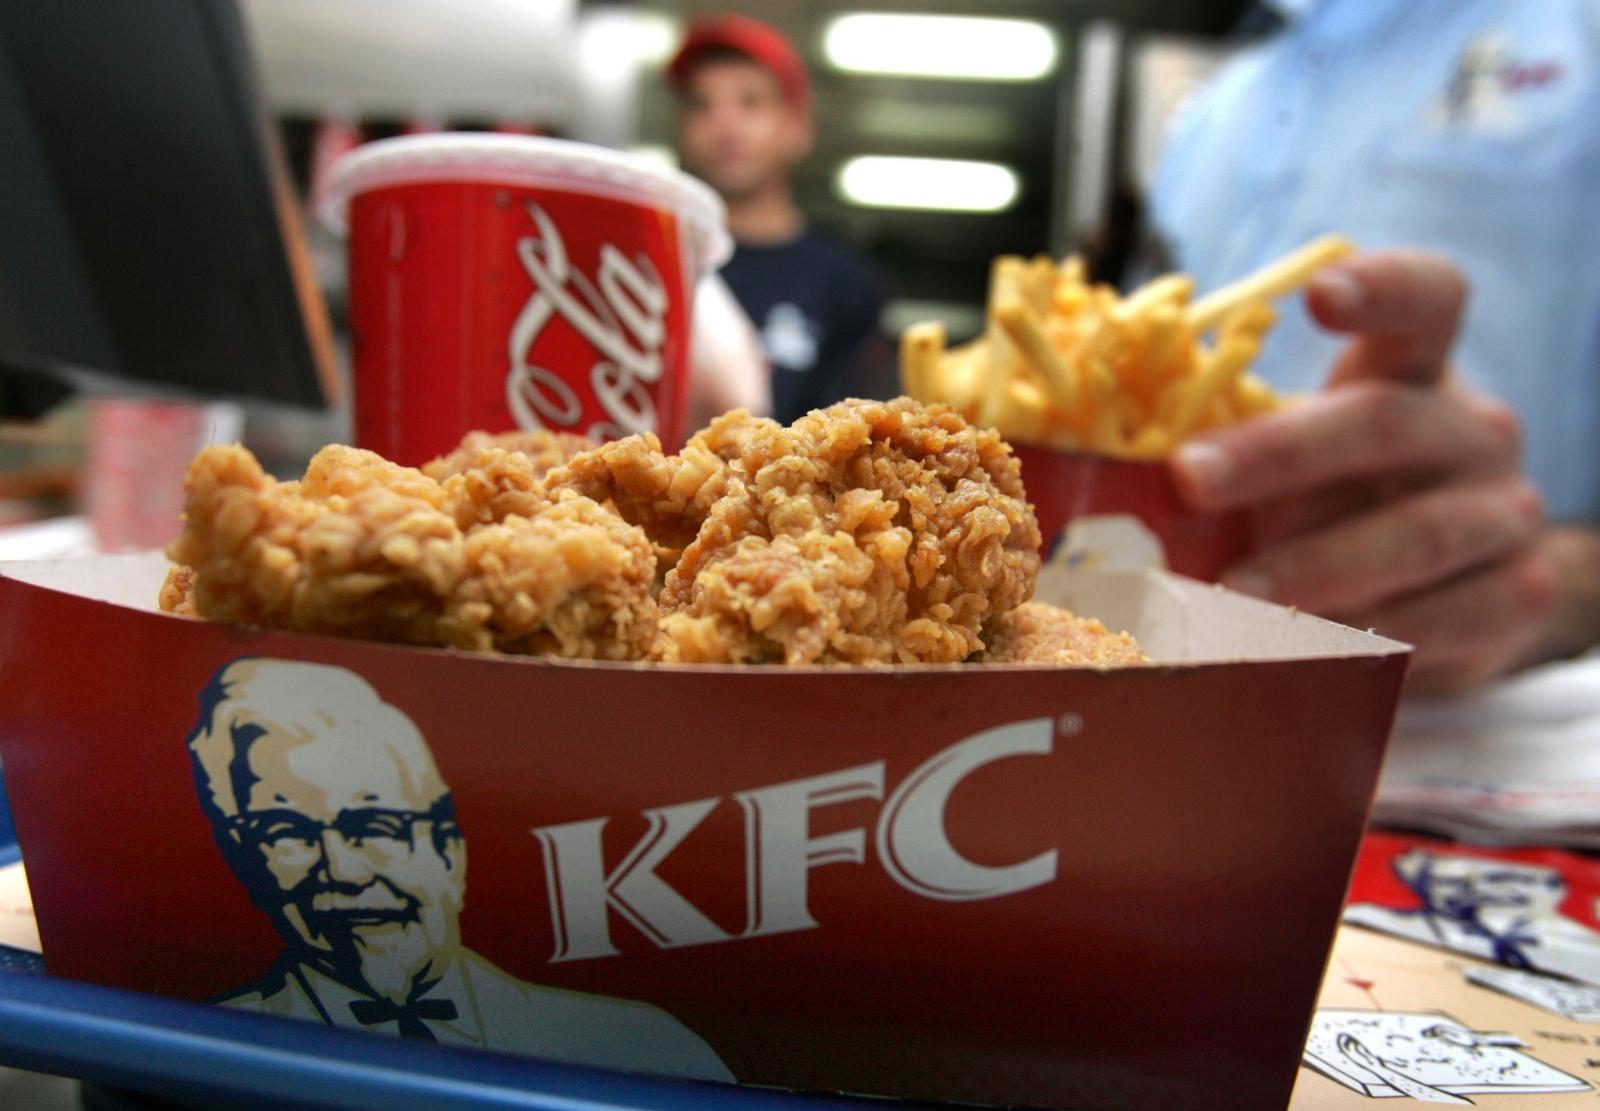 Image result for Britain KFC Spokesman Says Restart Services Limited Level